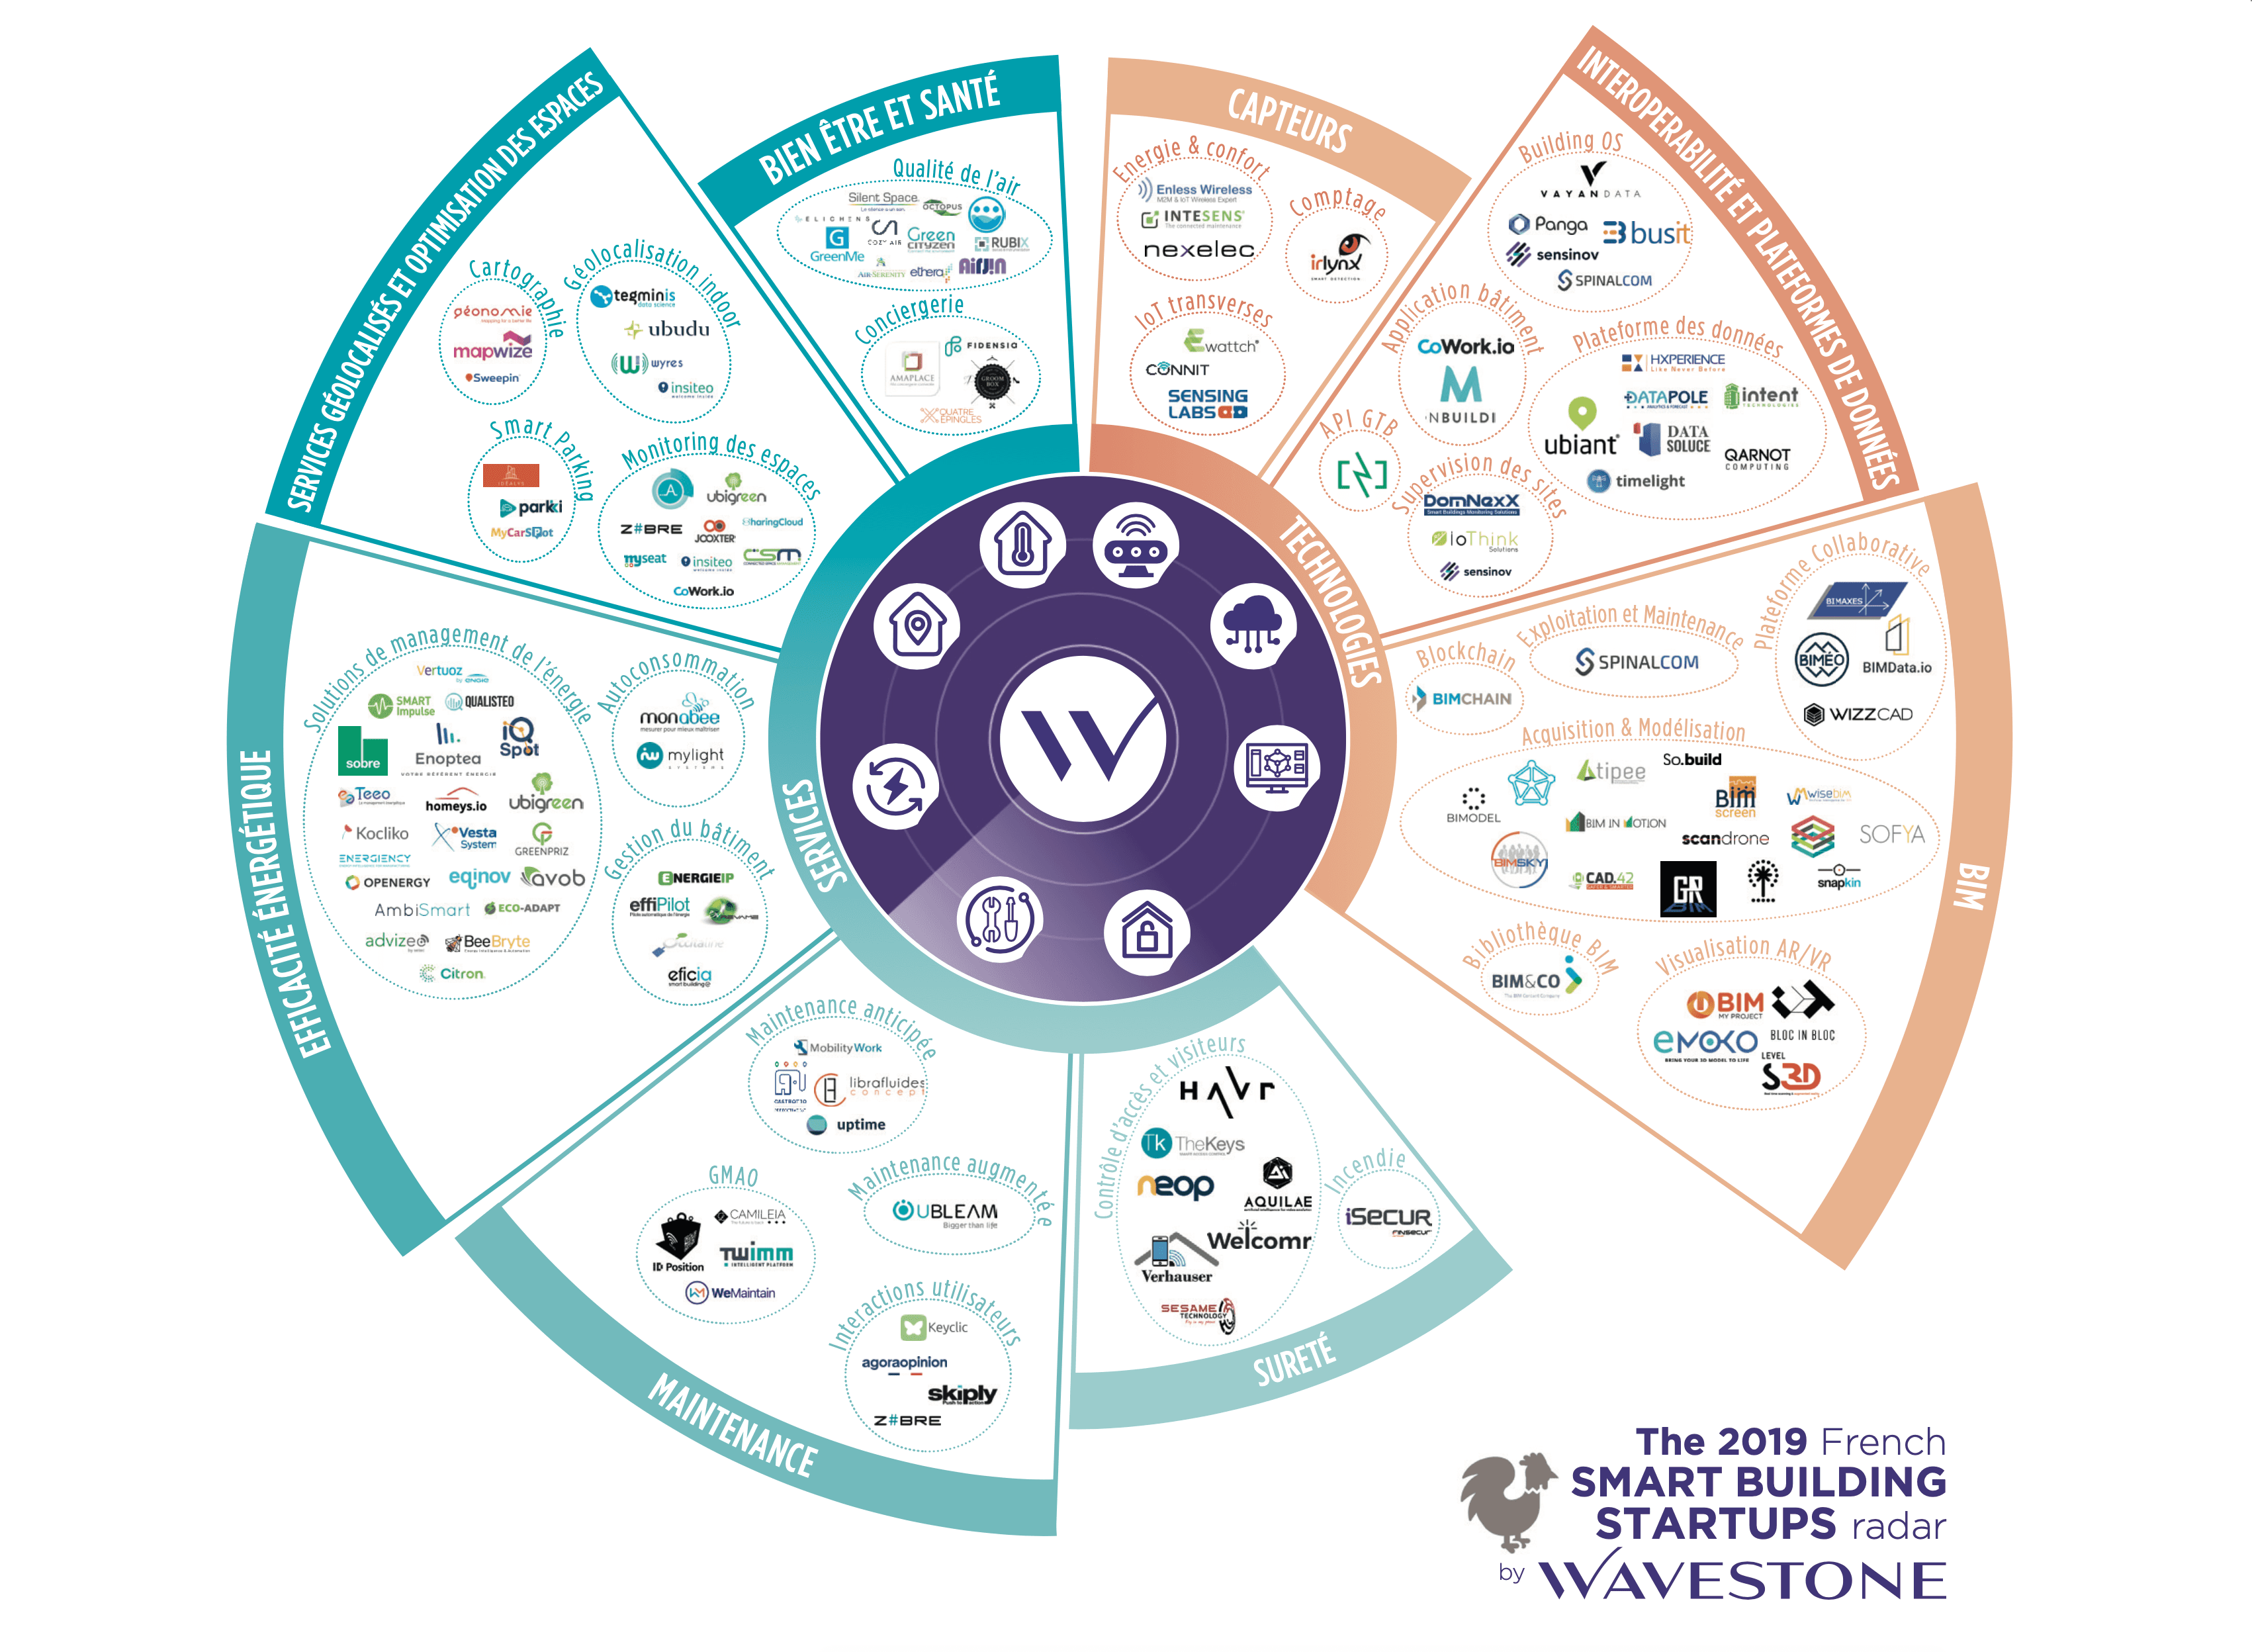 Wavestone cite Welcomr parmi les startups innovantes du smart building